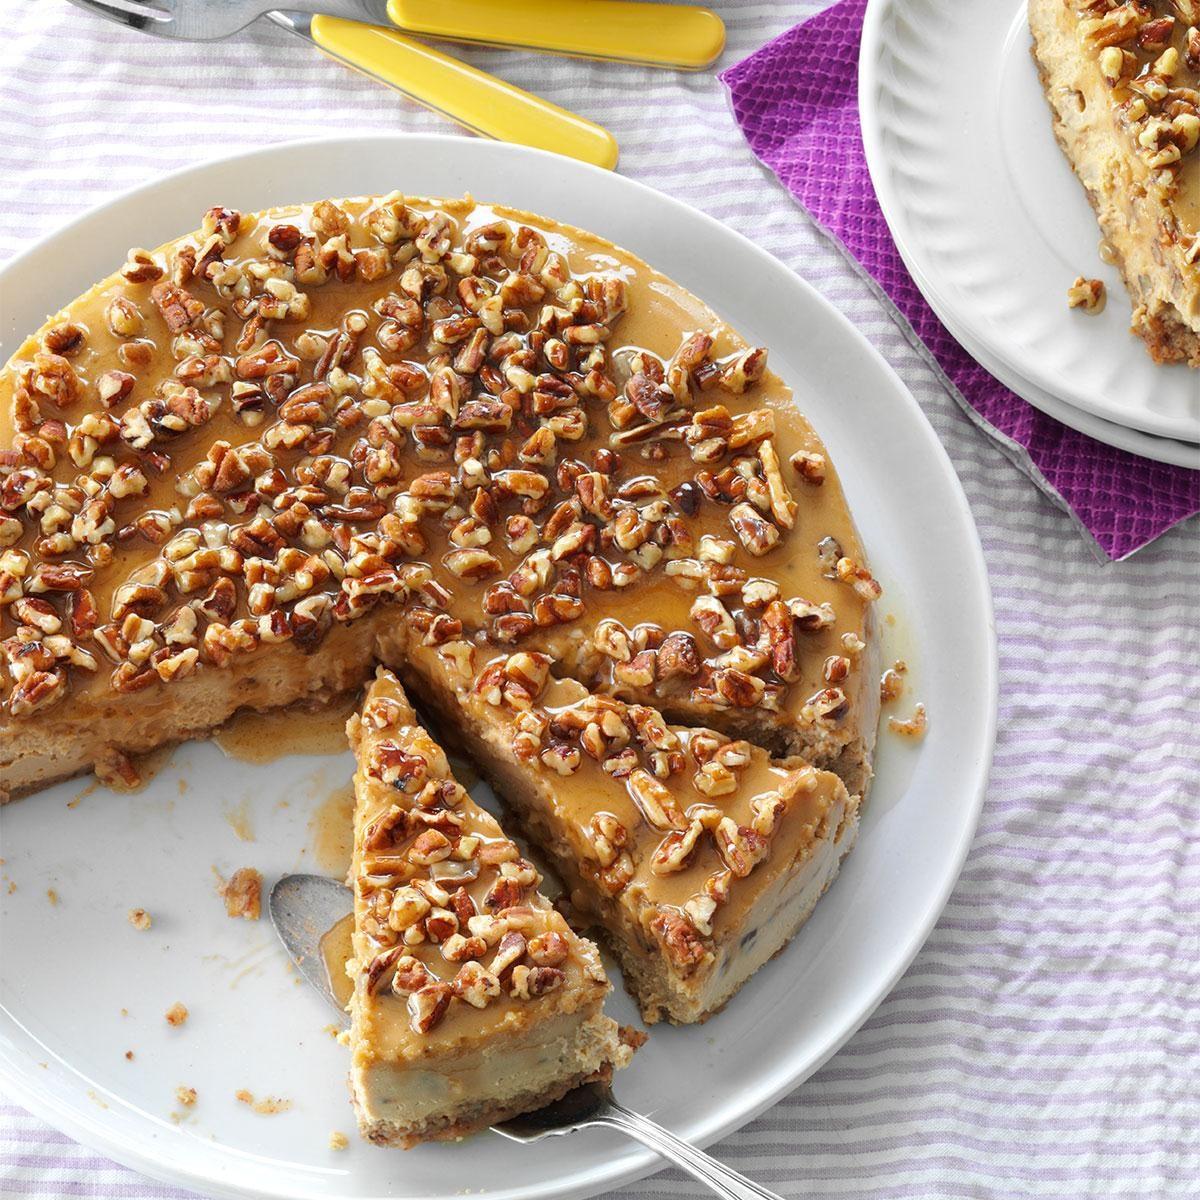 Honey Pecan Cheesecake Recipe | Taste of Home